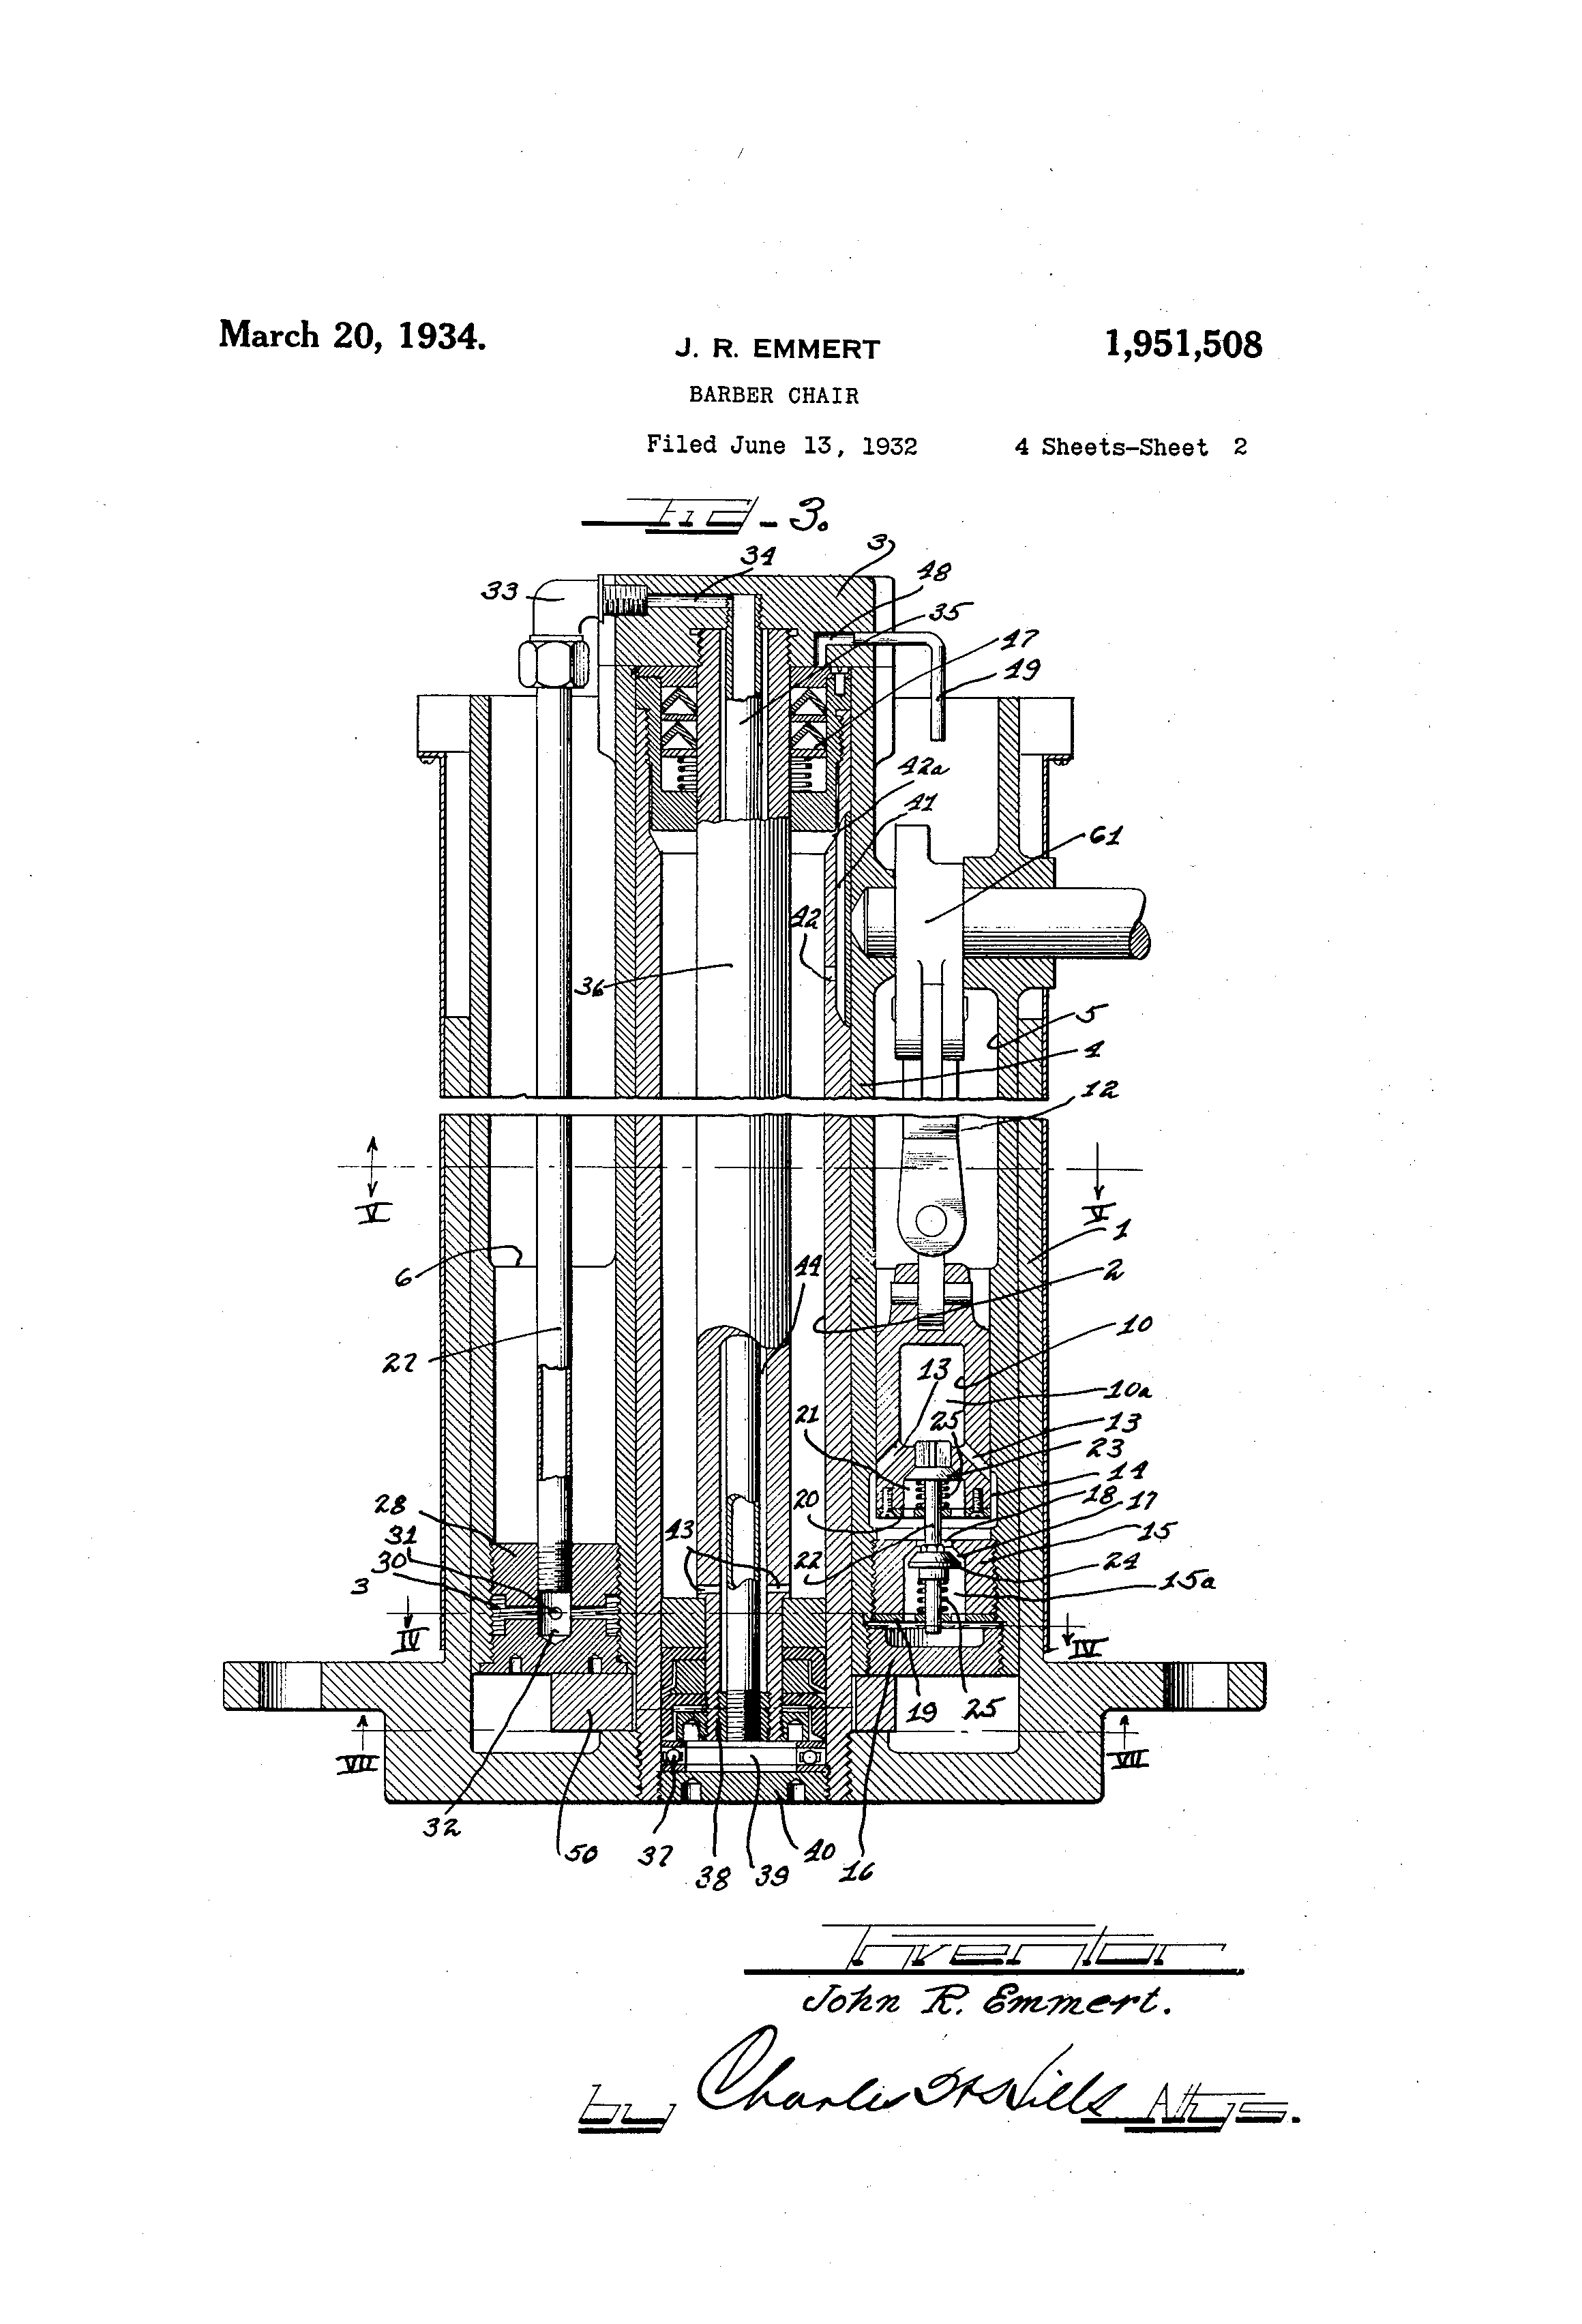 b136b1b3-0255-4030-b5db-e6a995321fb0_US1951508-1[1].png